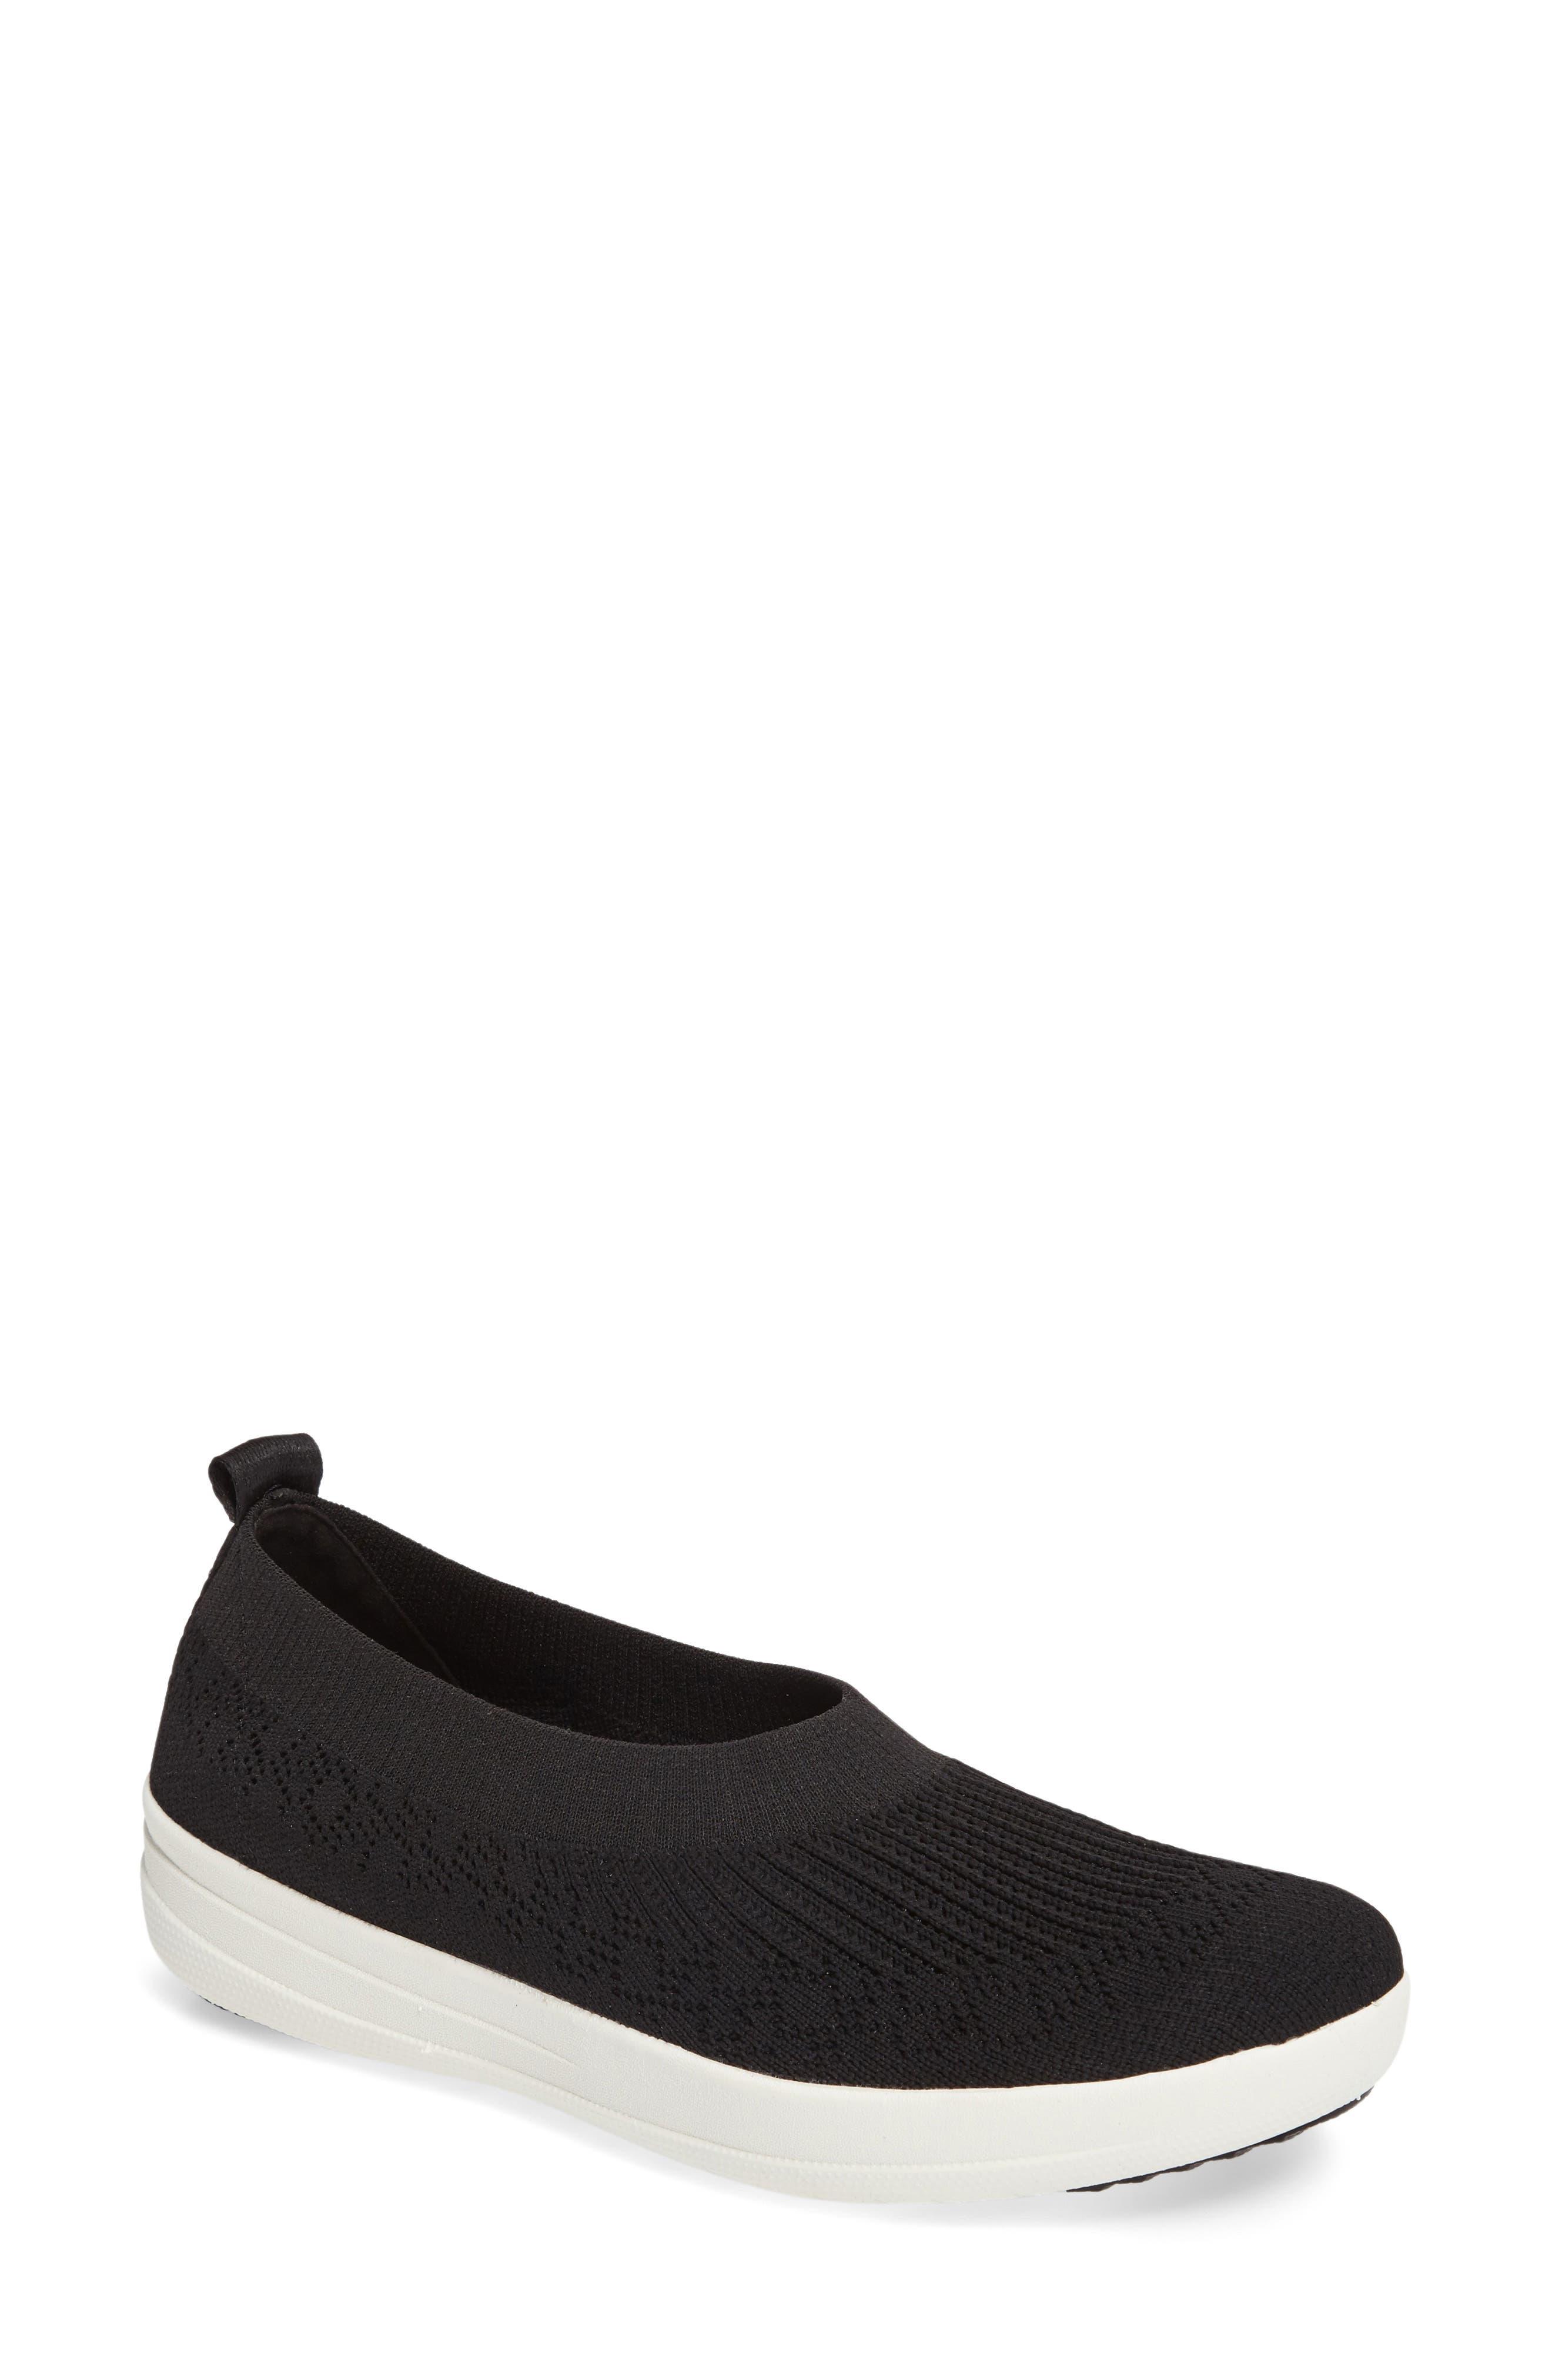 Uberknit Slip-On Sneaker,                         Main,                         color, BLACK FABRIC